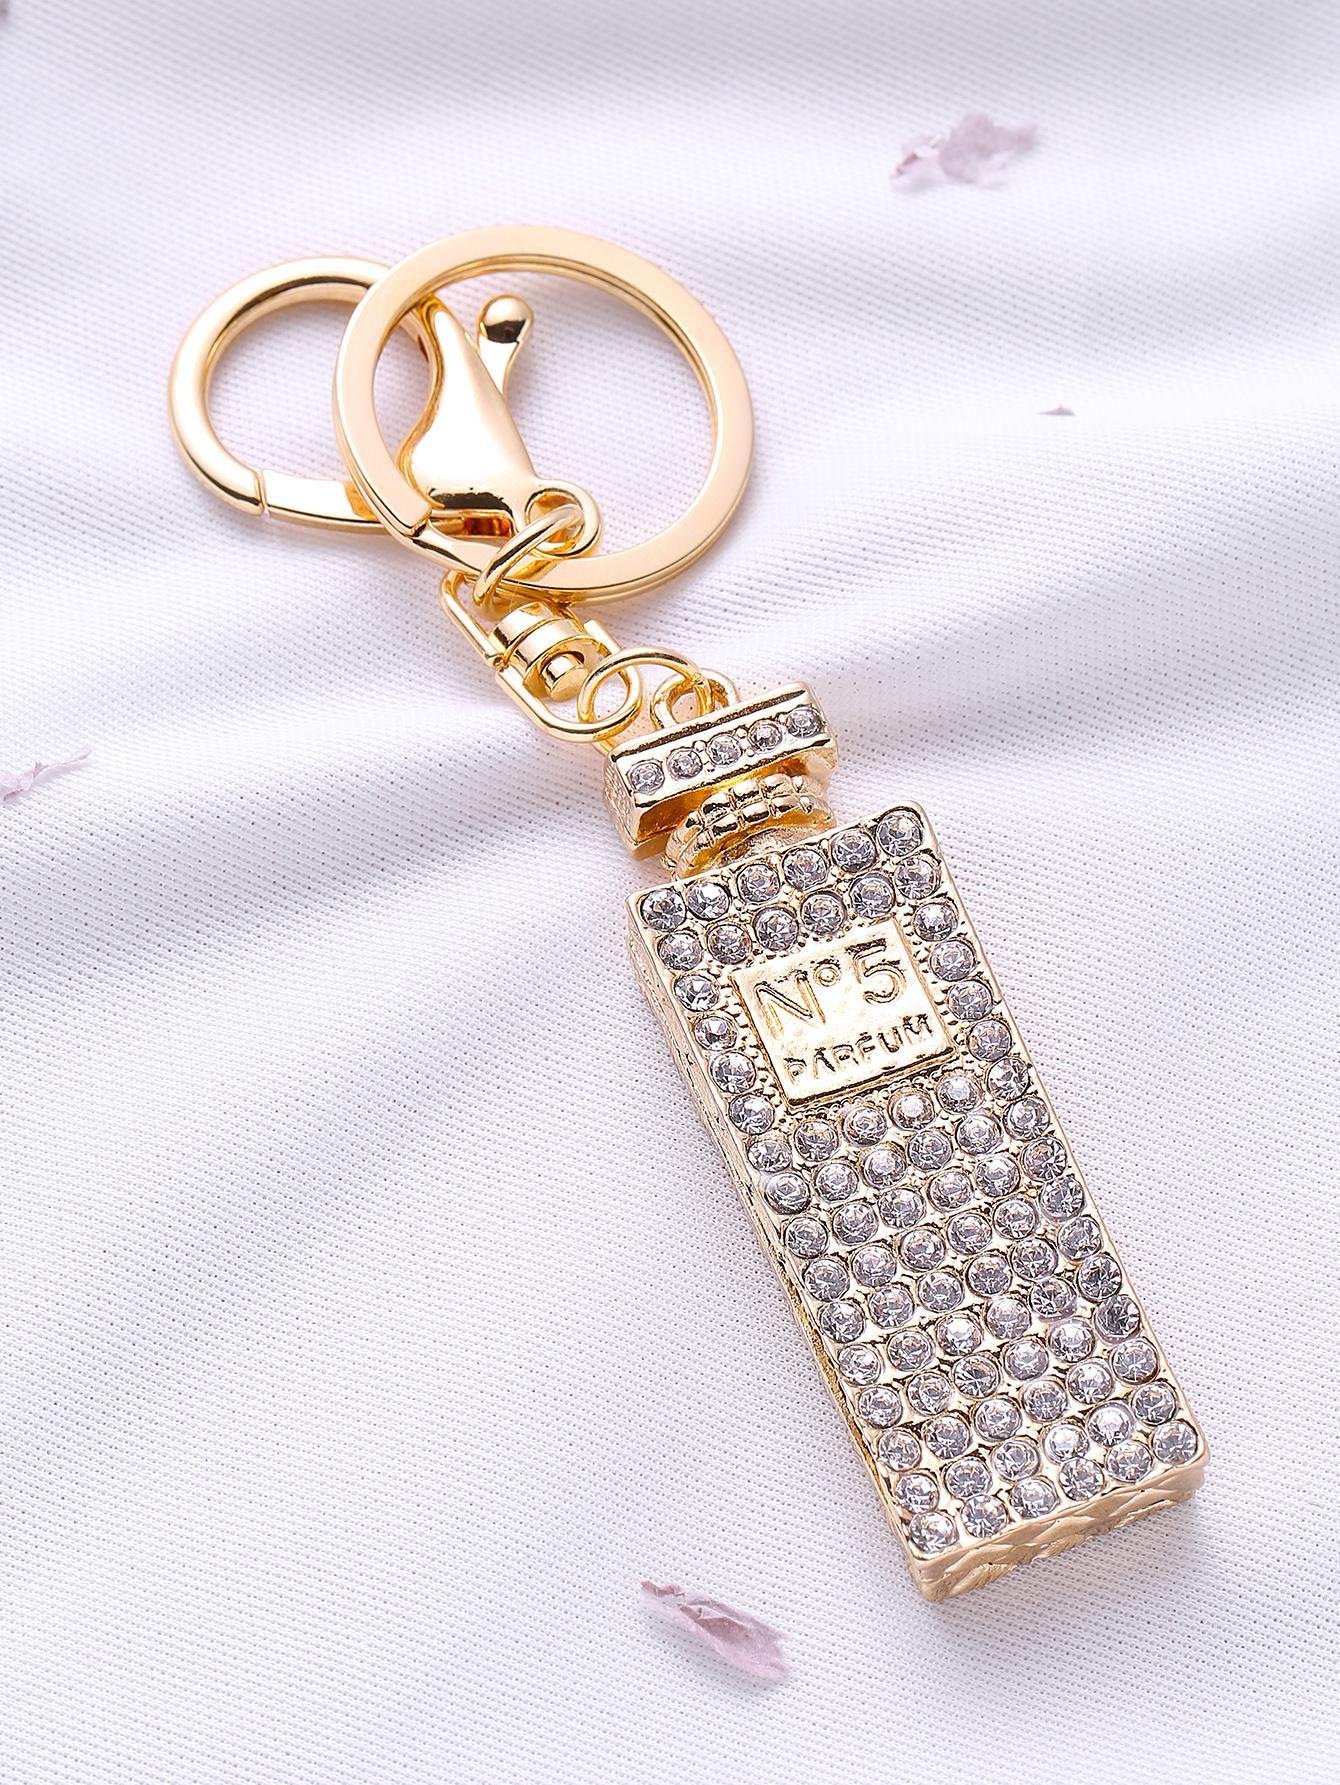 d2578dd13f80 ROMWE - ROMWE Gold Rhinestone Perfume Bottle Keychain - AdoreWe.com ...